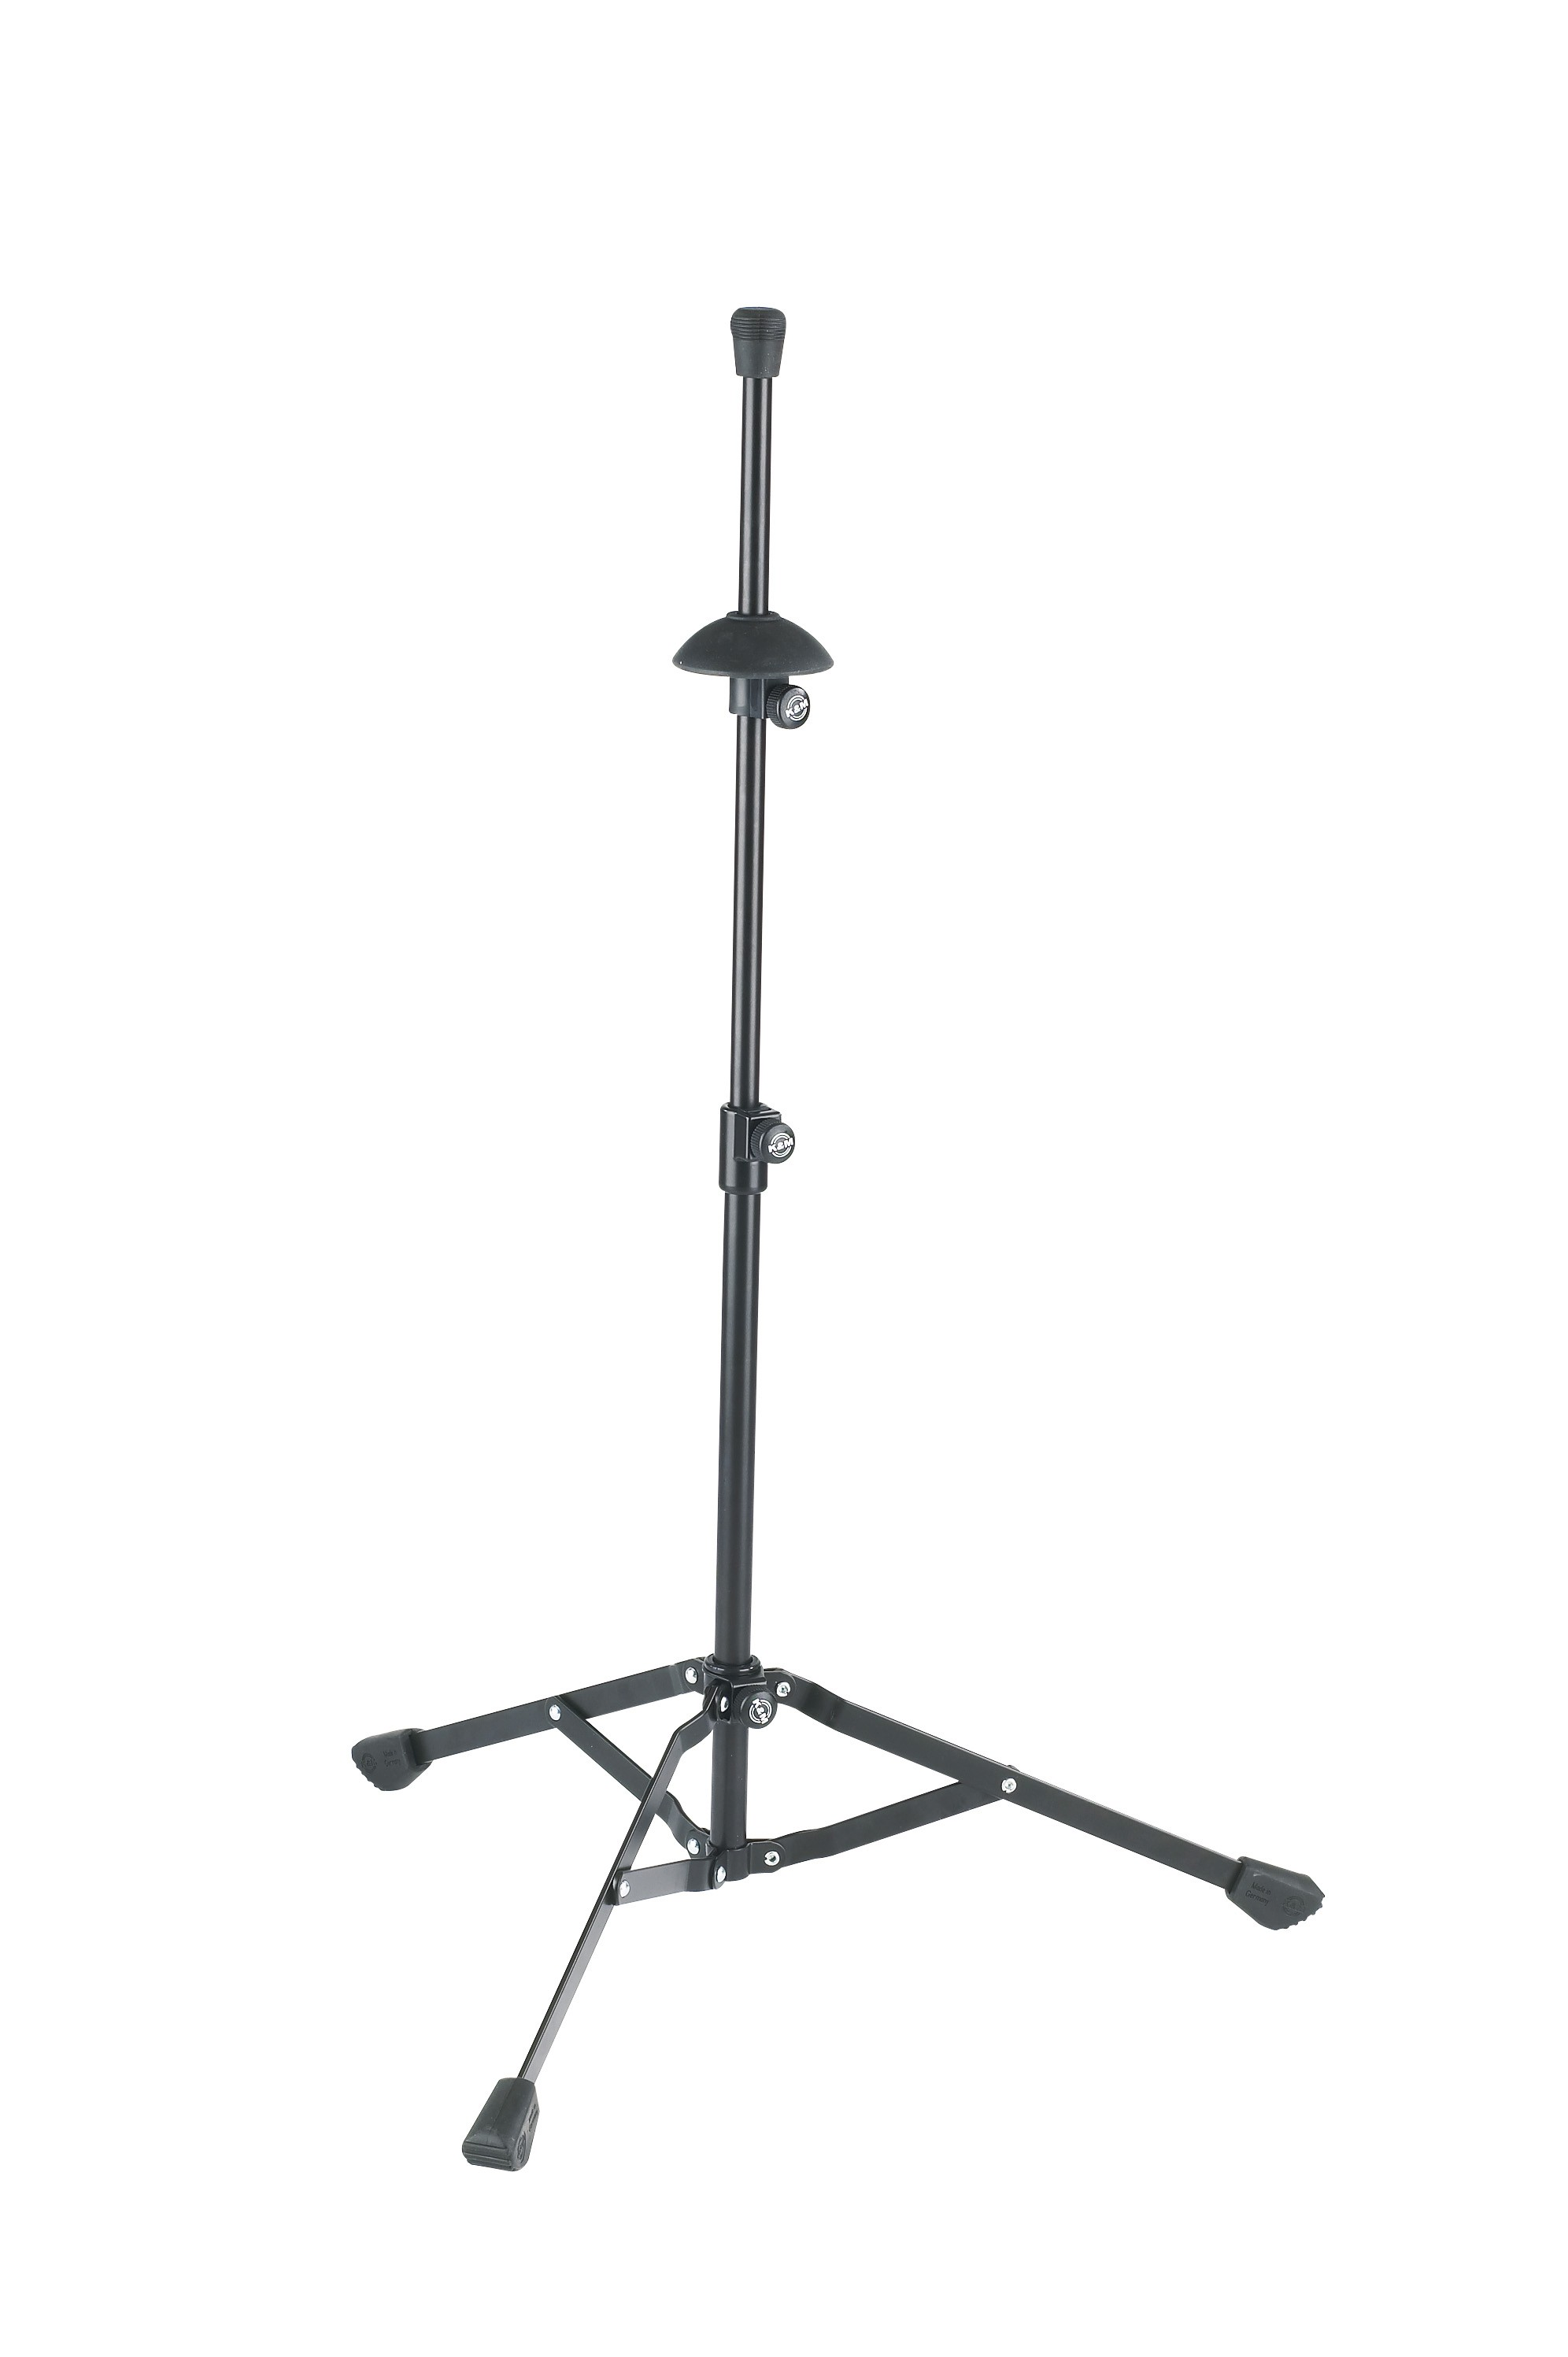 Konig & Meyer 149/9 Trombone Stand